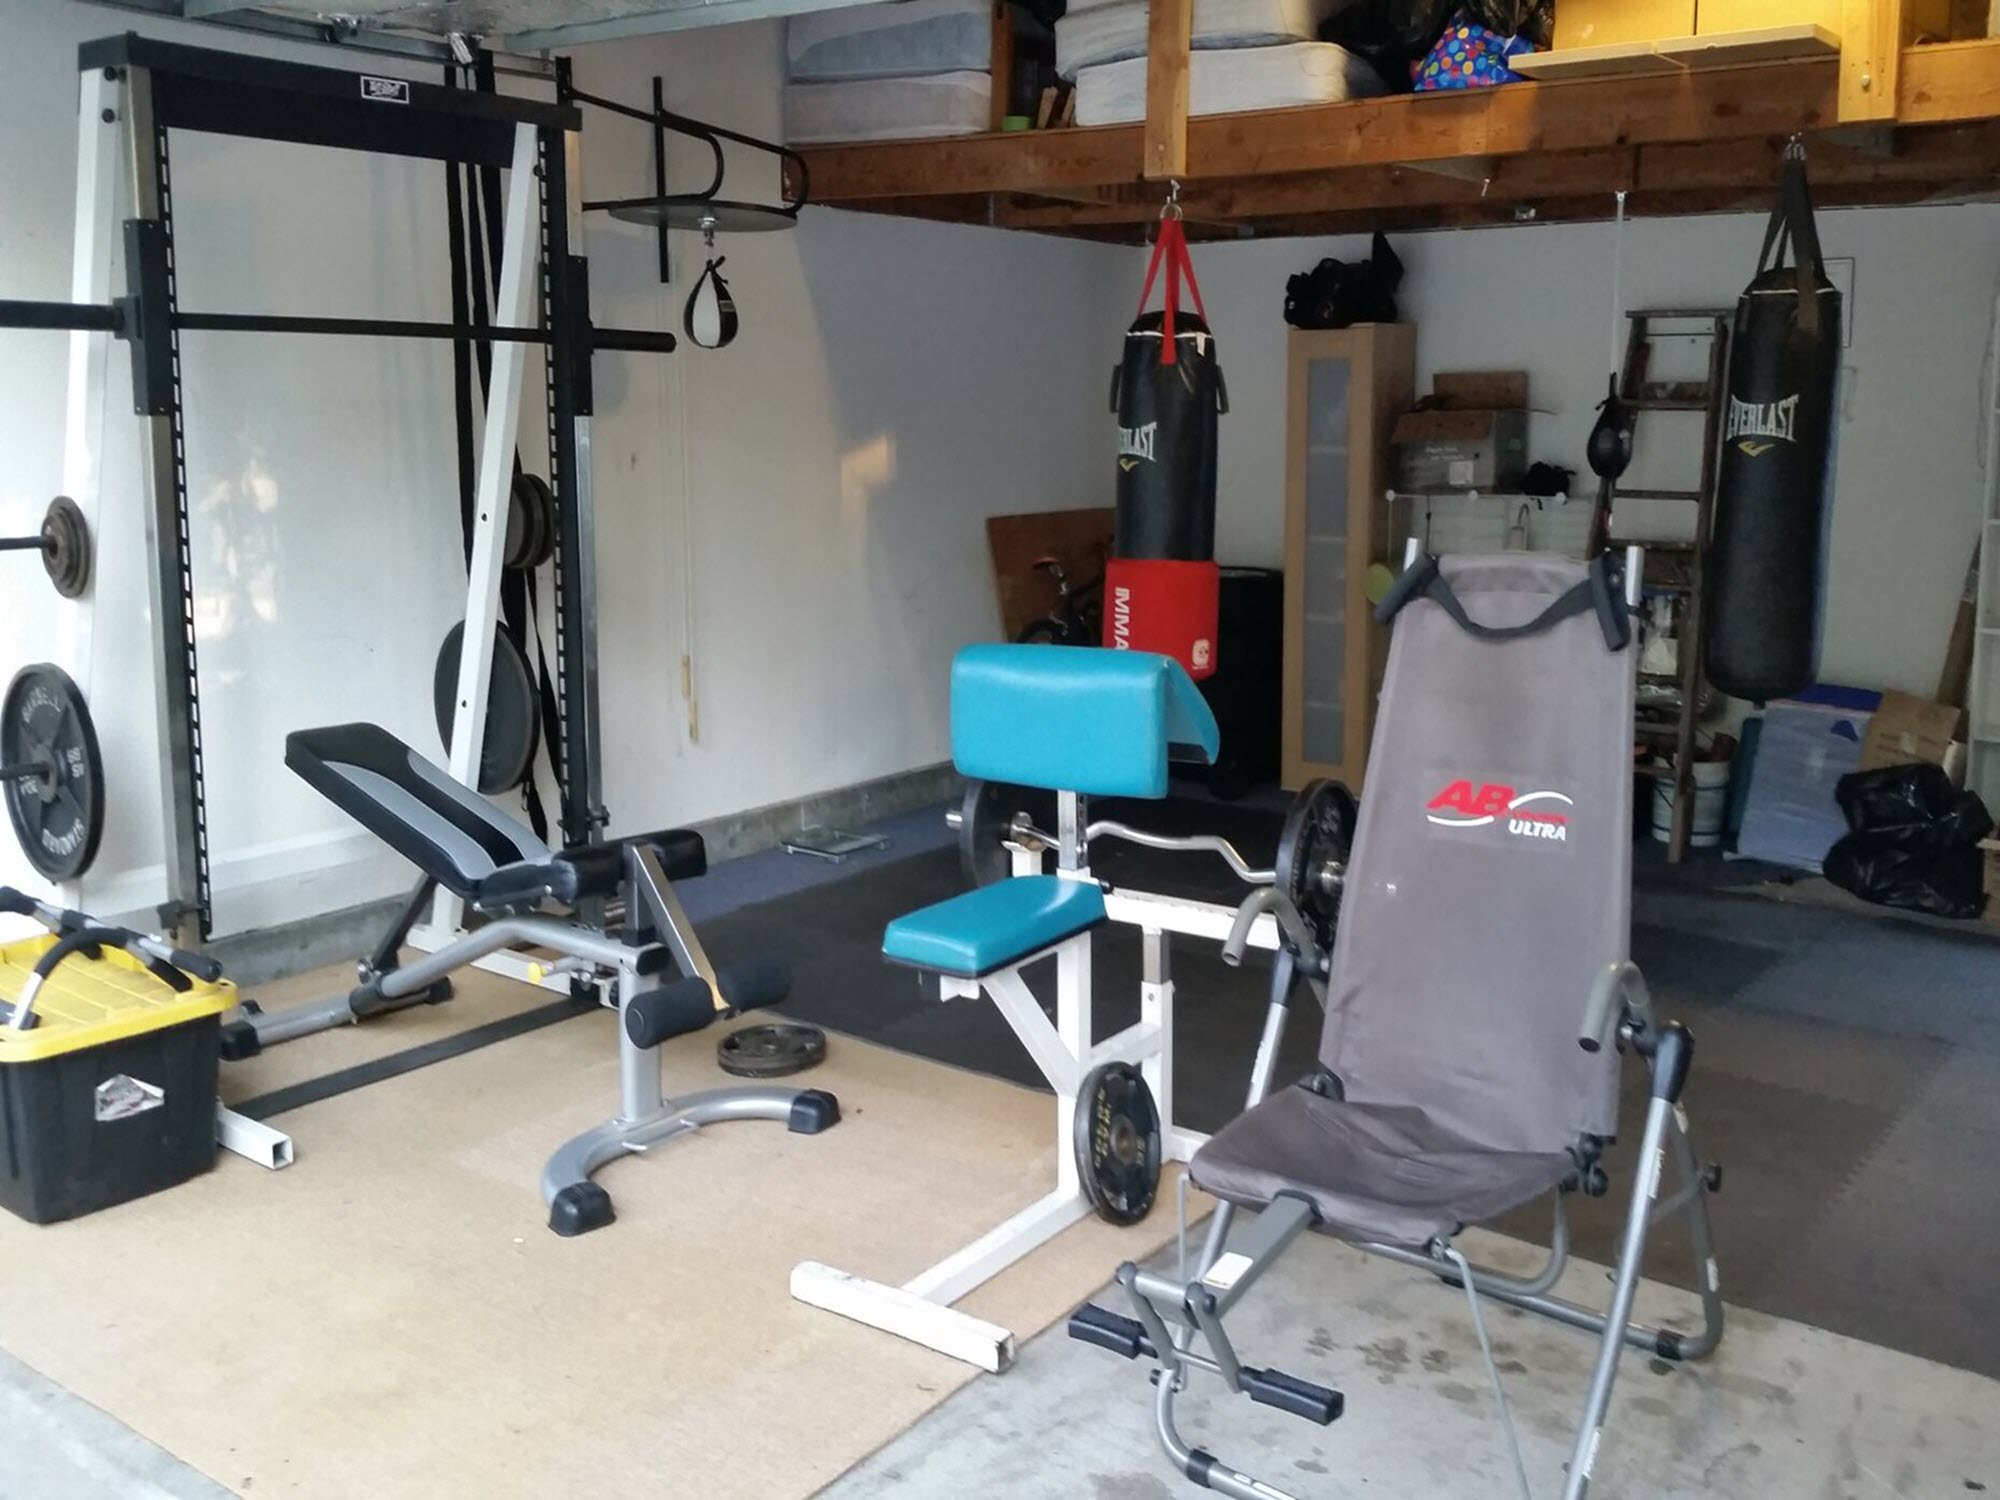 Eldorado San Francisco Bay Area Sober Living with Gym and Workout Space